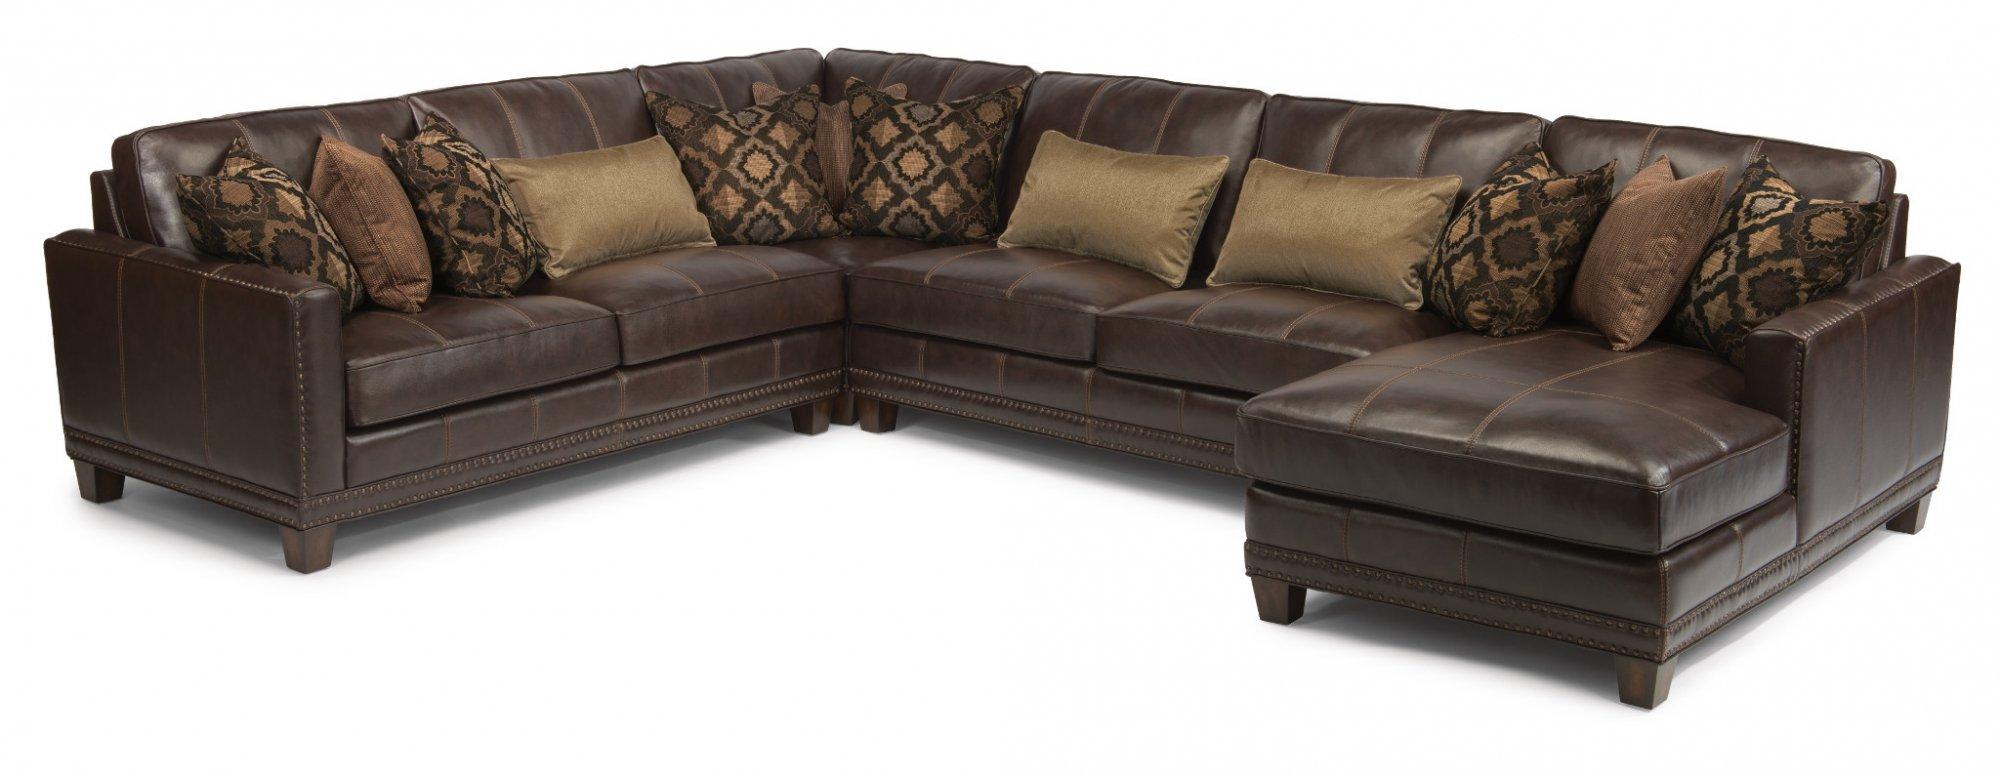 Pleasant Flexsteel 1373 Sect Port Royal Leather Sectional Craig Evergreenethics Interior Chair Design Evergreenethicsorg